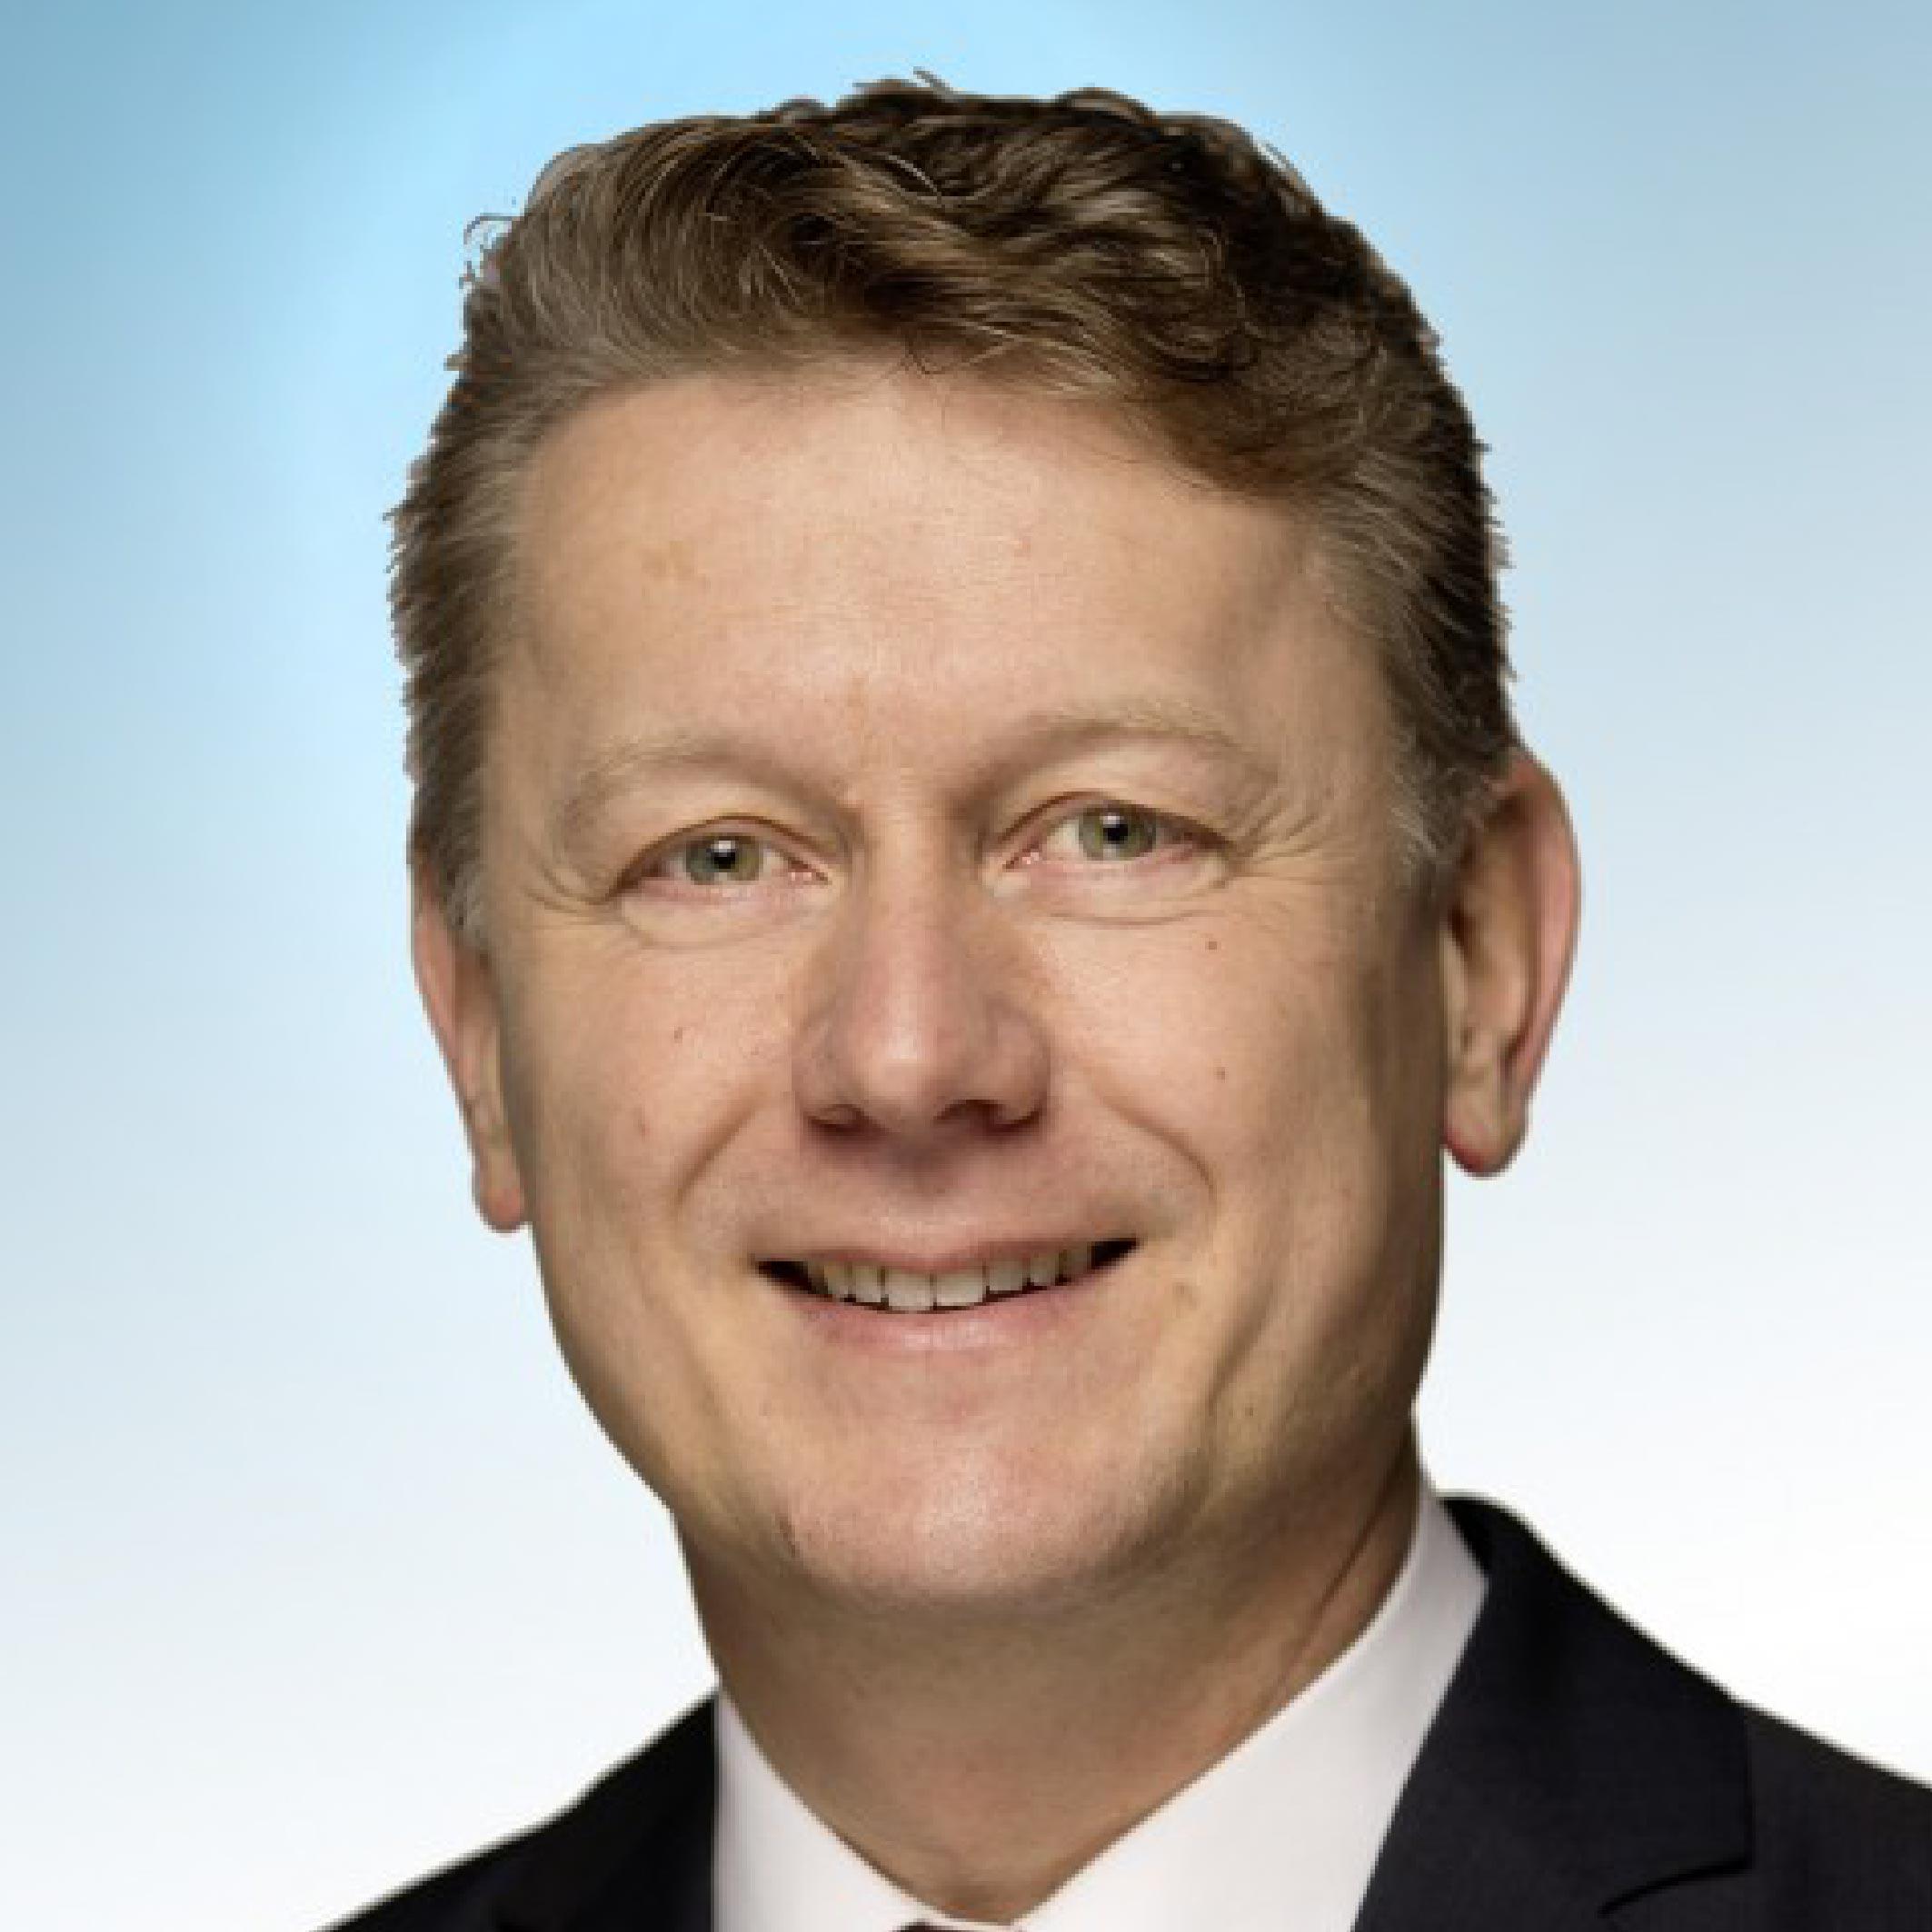 New managing director of medifa metal and medical engineering GmbH